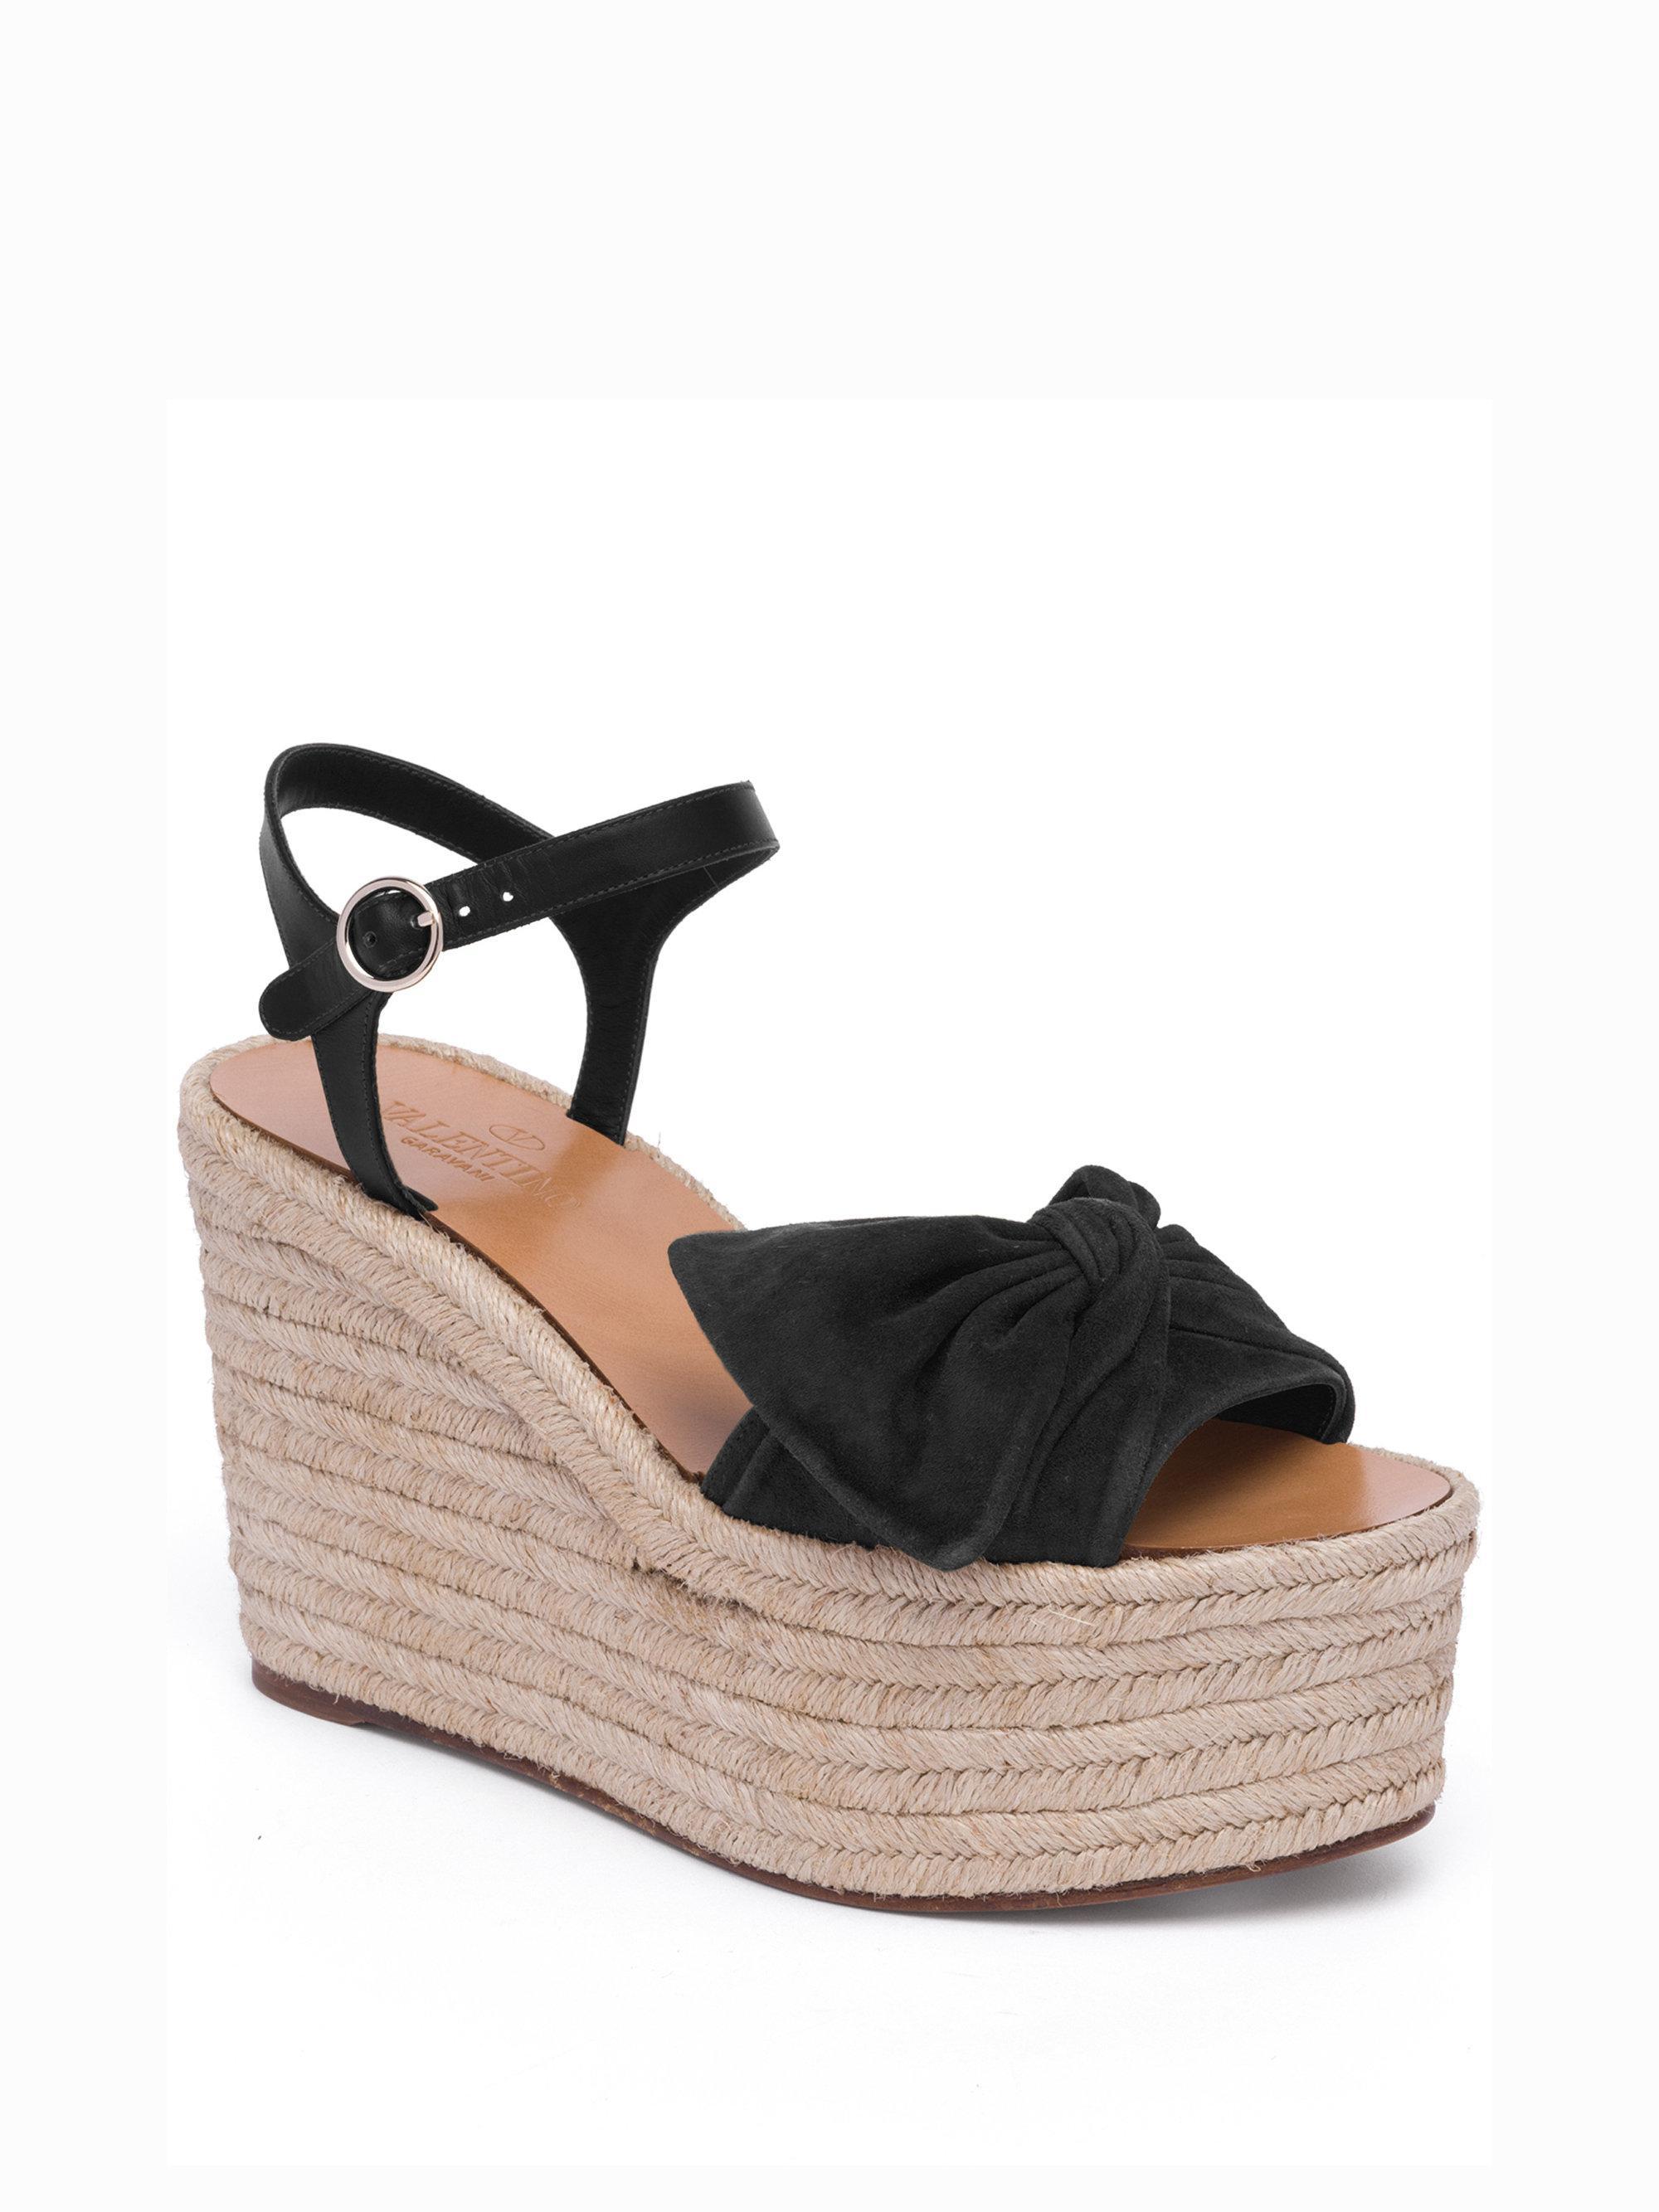 1a94a4036c4 Women's Black Tropical Bow Suede Espadrille Wedge Platform Sandals